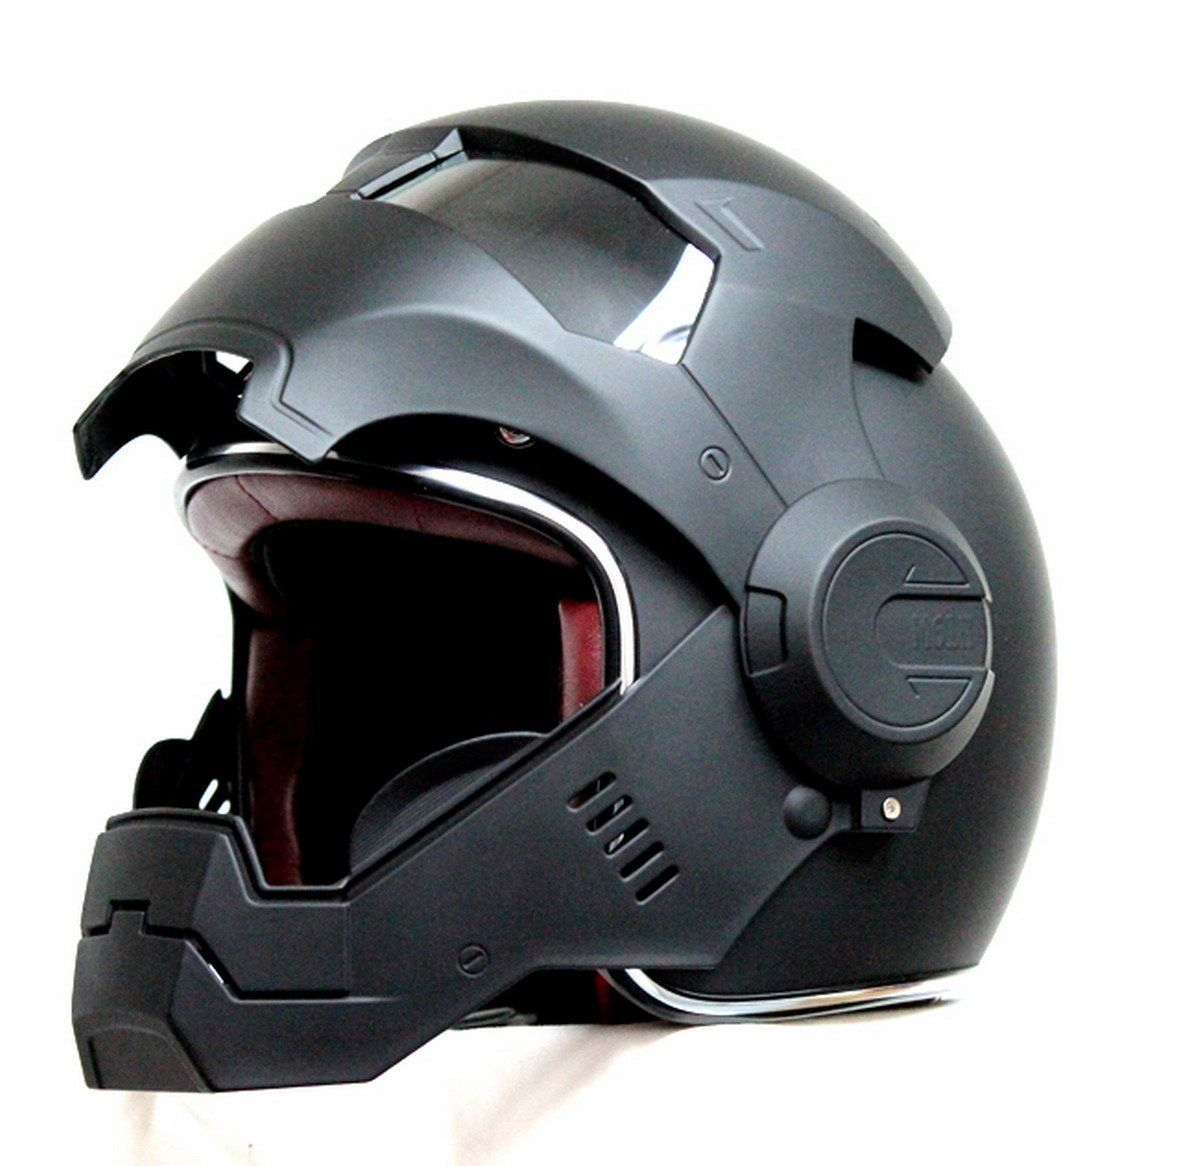 Amazon.com: LC Prime® Masei 610 Matt Black Atomic Man Motorcycle Modular Open Face HJC Icon DOT Helmet: Automotive